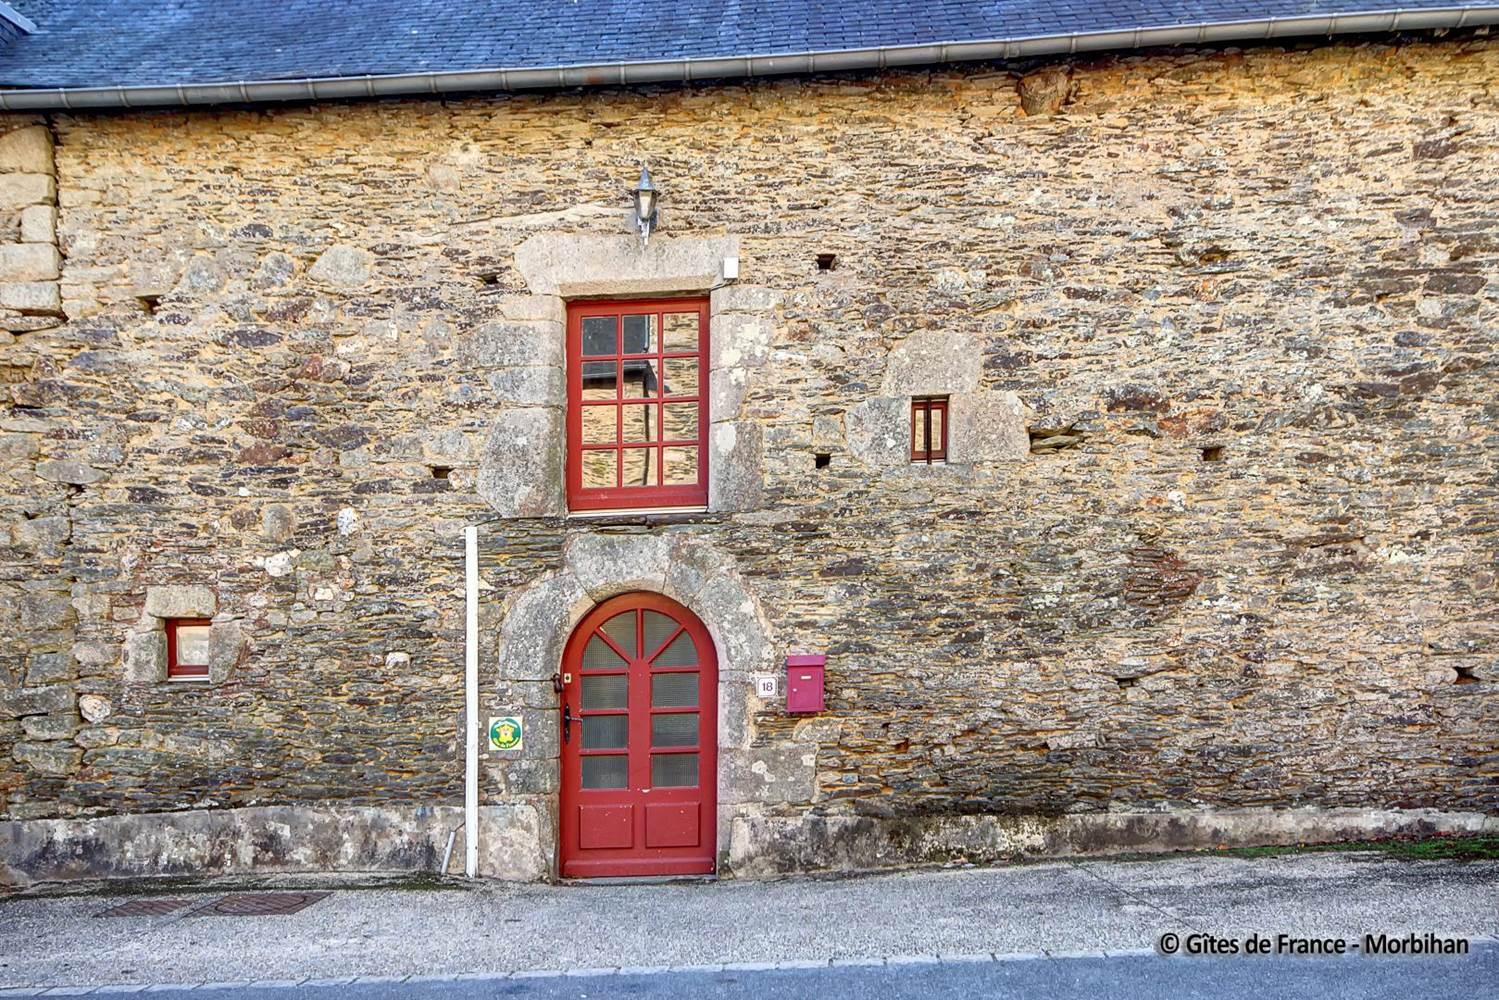 Gîte n°56G792 – GUILLAC – Morbihan Bretagne Sud © GITES DE France 56